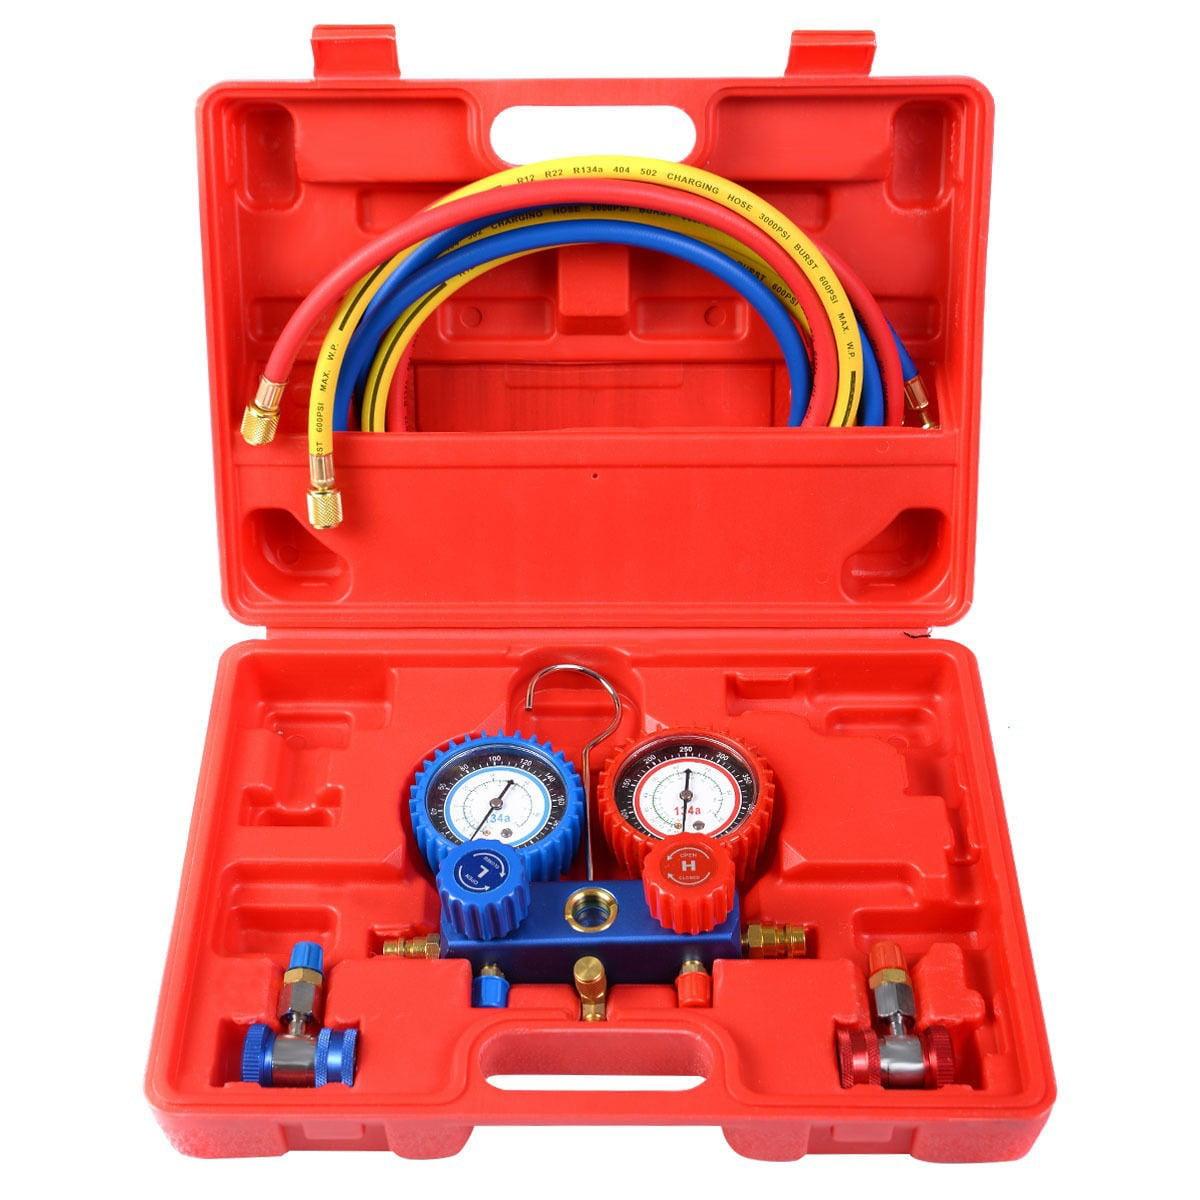 R134A Manifold Gauge Set AC A/C 6FT Colored Hose Air Conditioner w/ Case